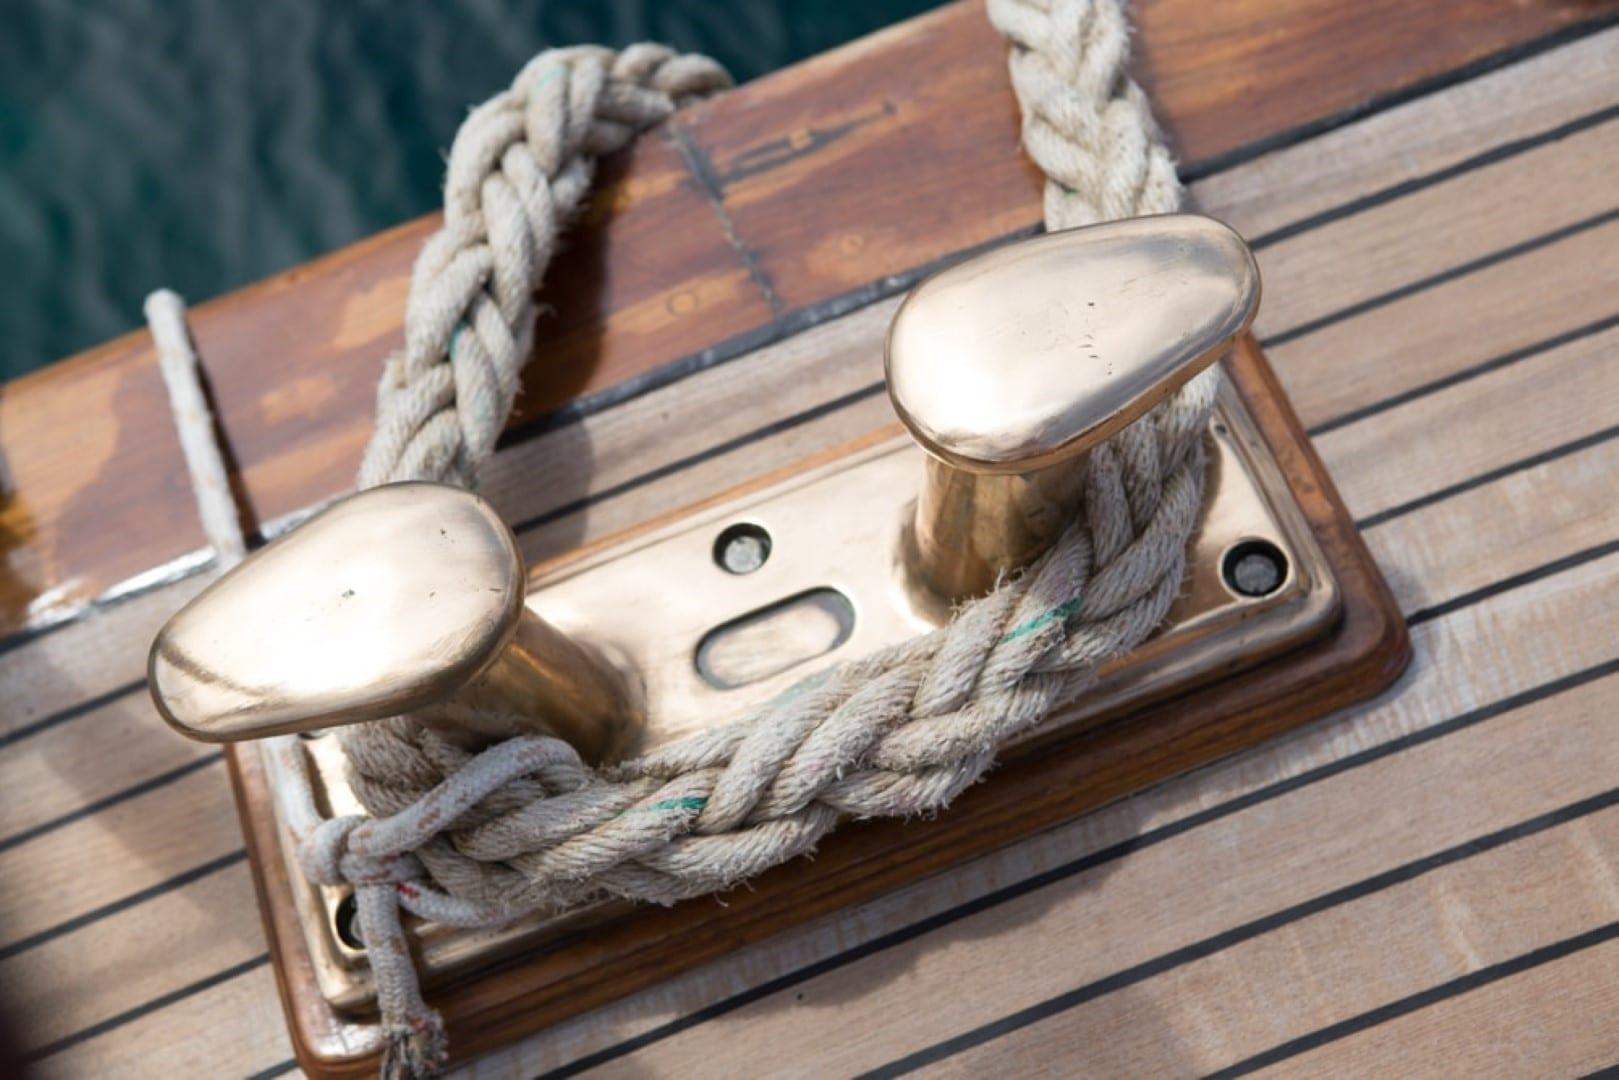 prince motor sailer details (2) -  Valef Yachts Chartering - 0908